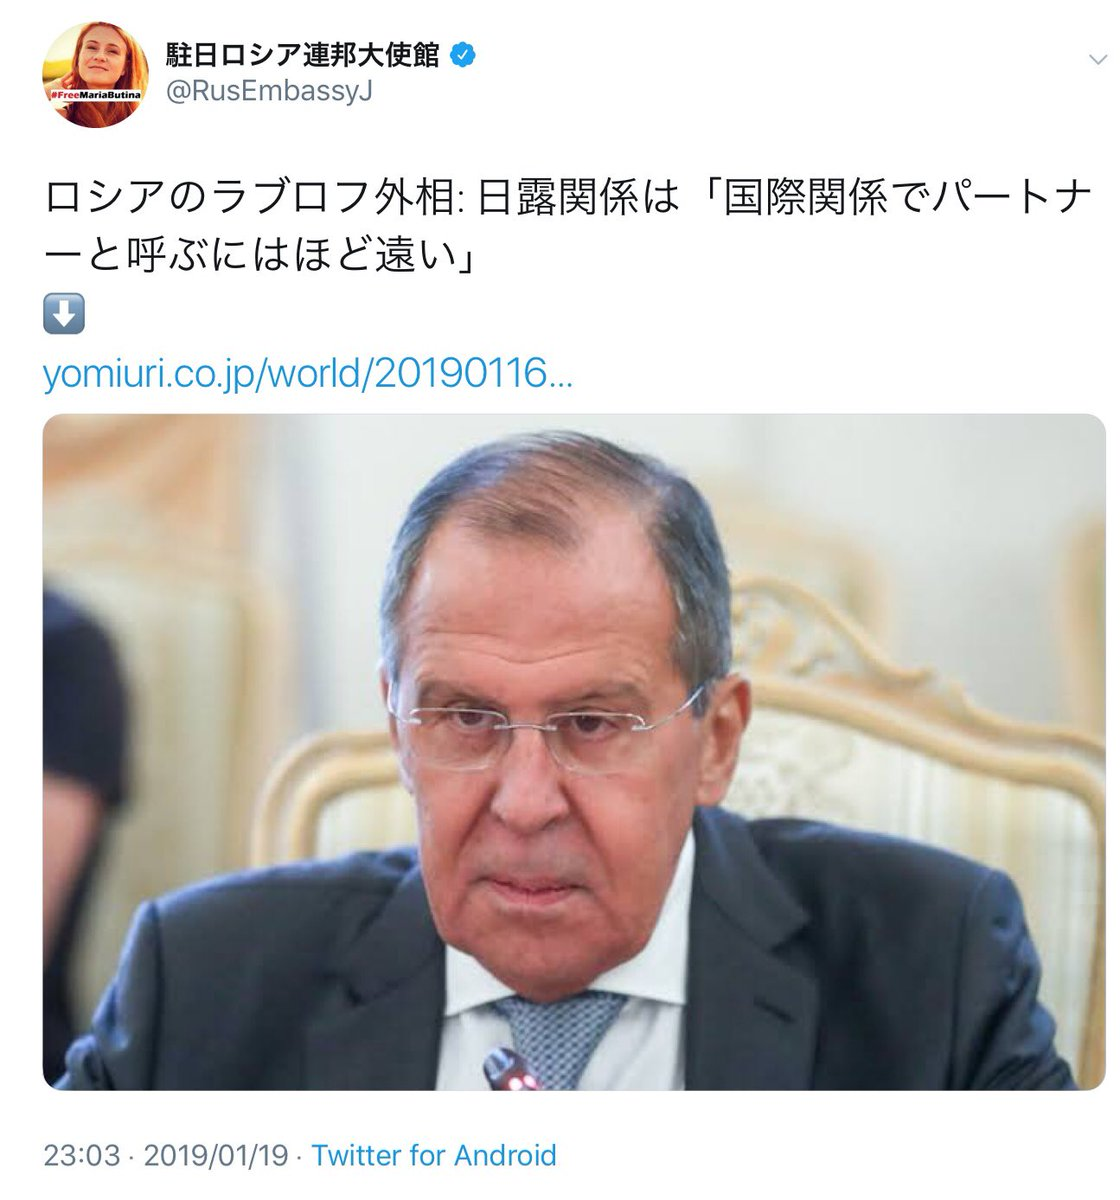 RT @akomaki: えらい扱いが違う。 https://t.co/HeQAkYFTjy